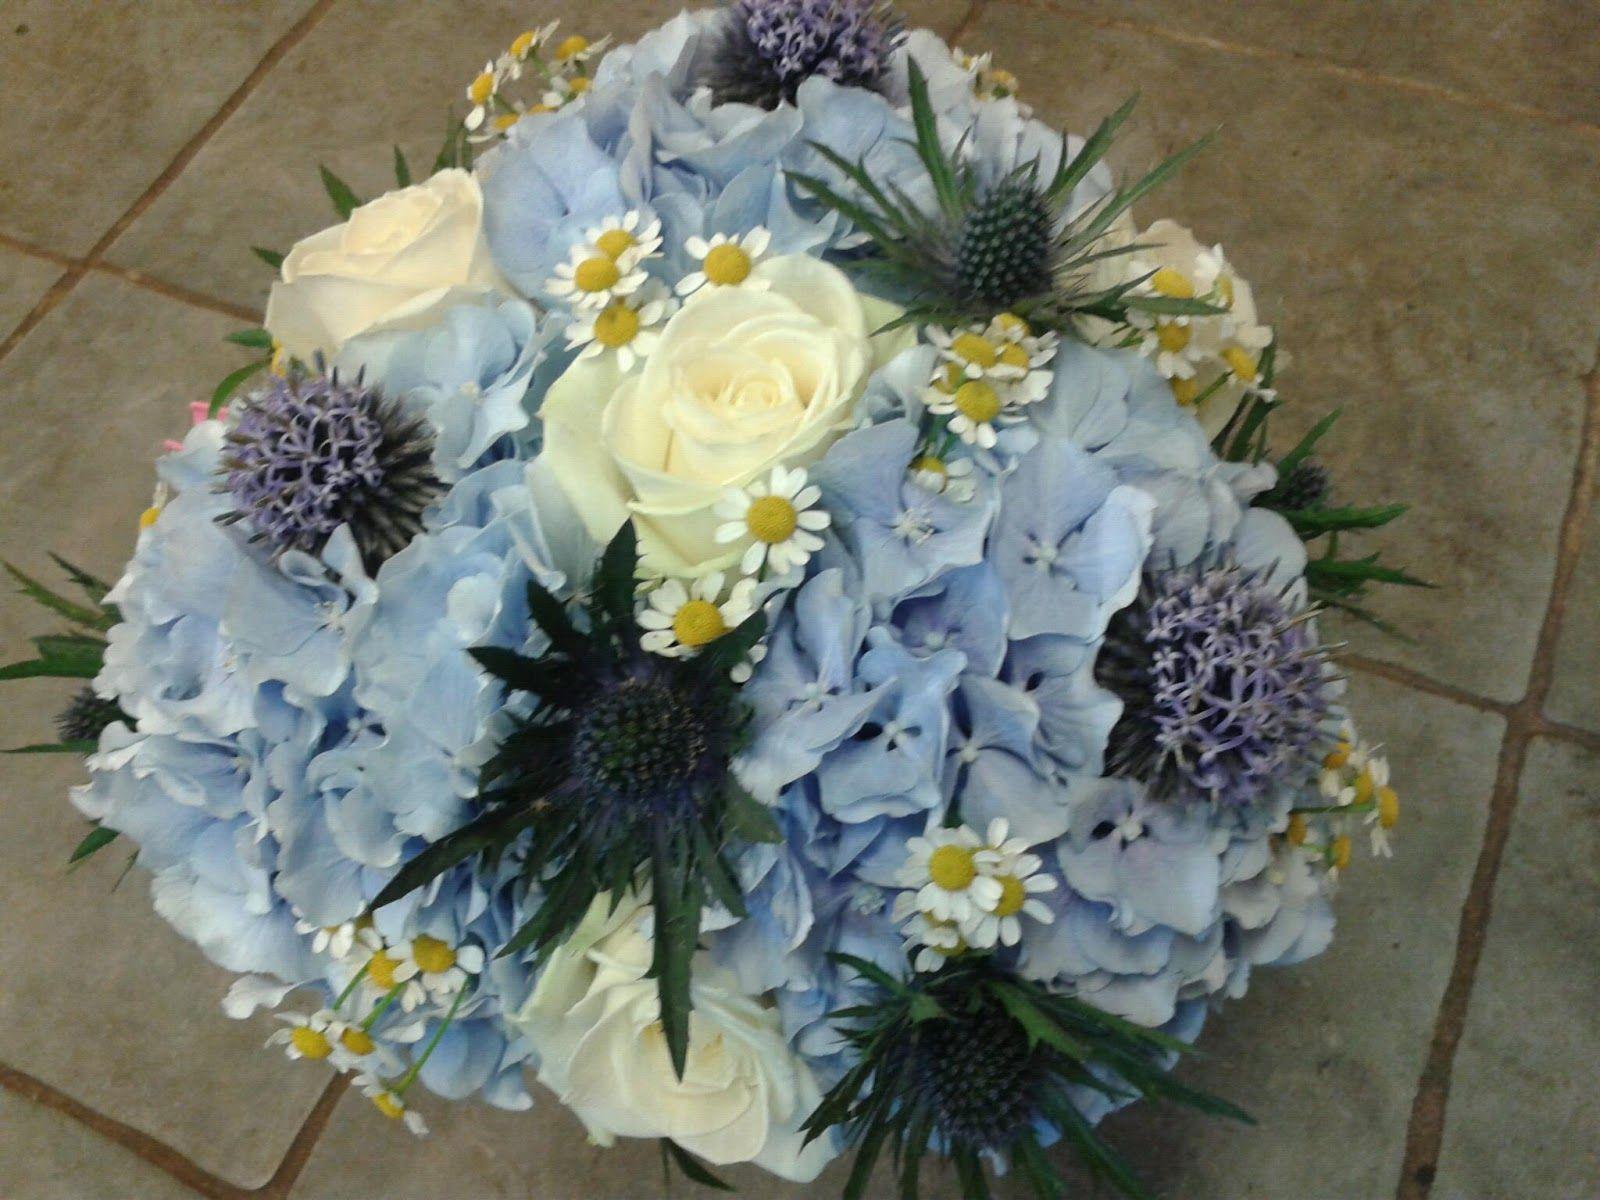 Blue Hydrangea, Blue Eryngium Thistle, Blue Glow Globes, Chamomile, White Roses Wedding Bouquet